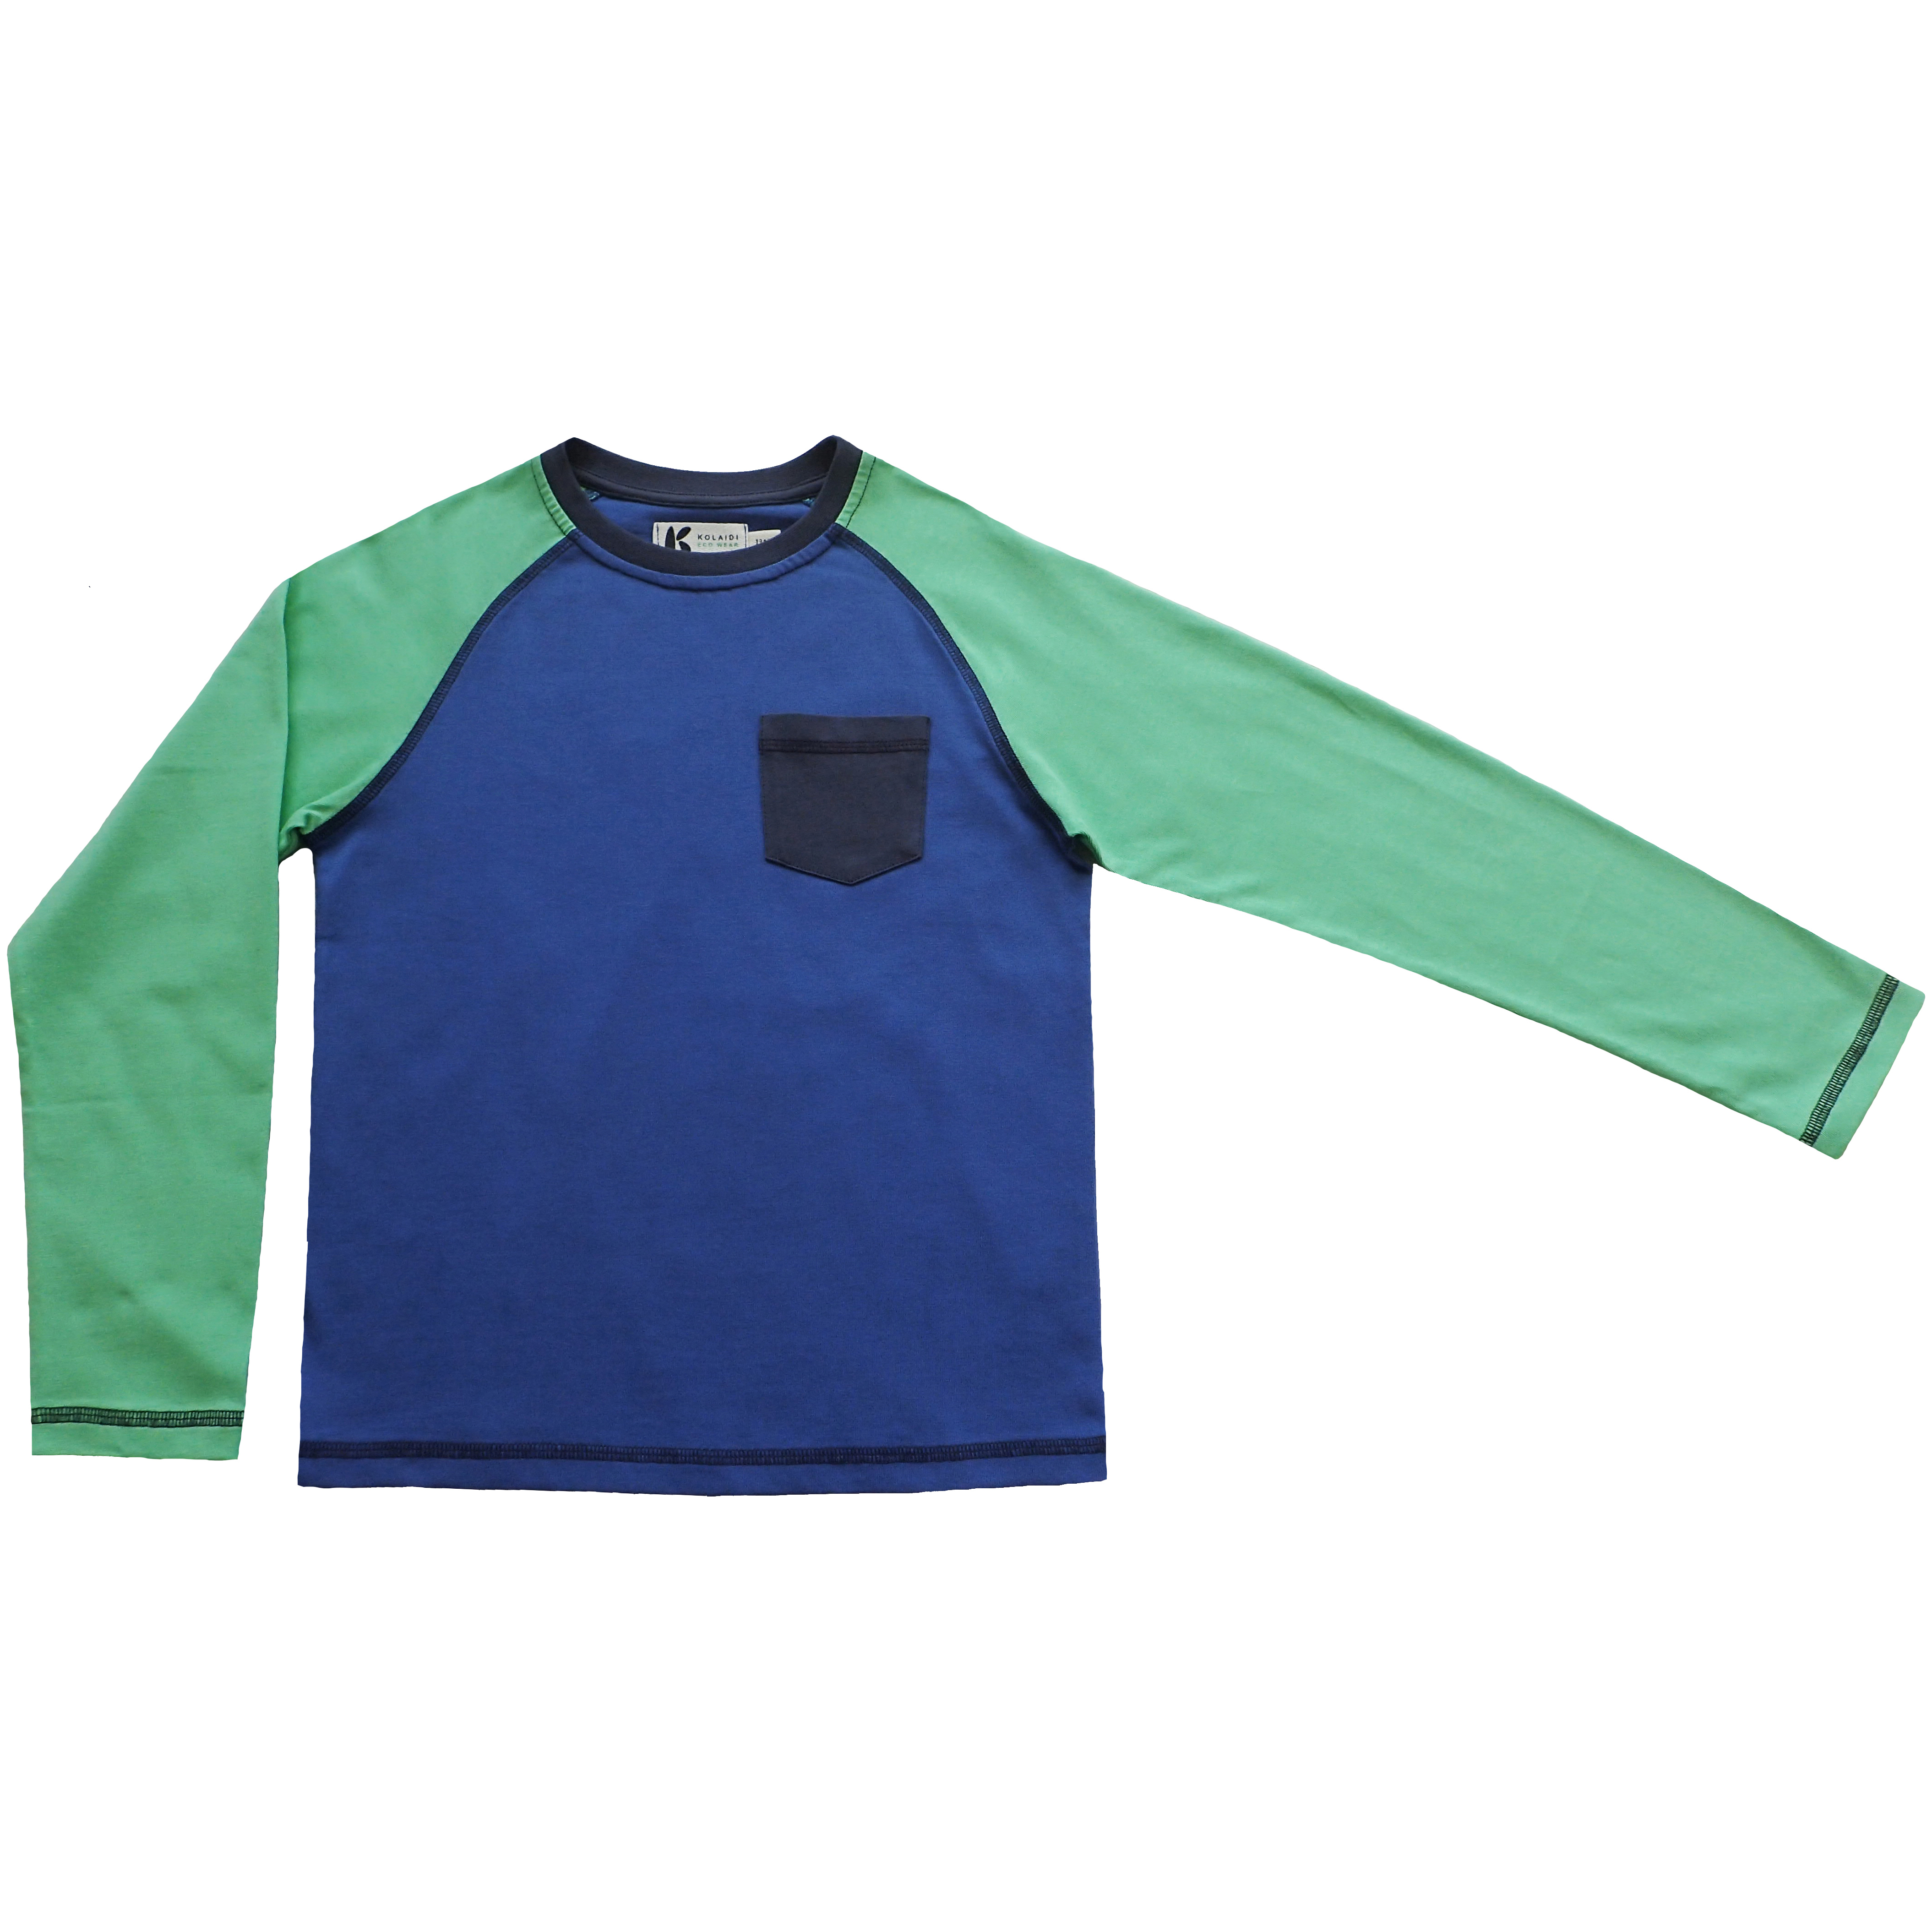 Drenge T-shirt med lomme